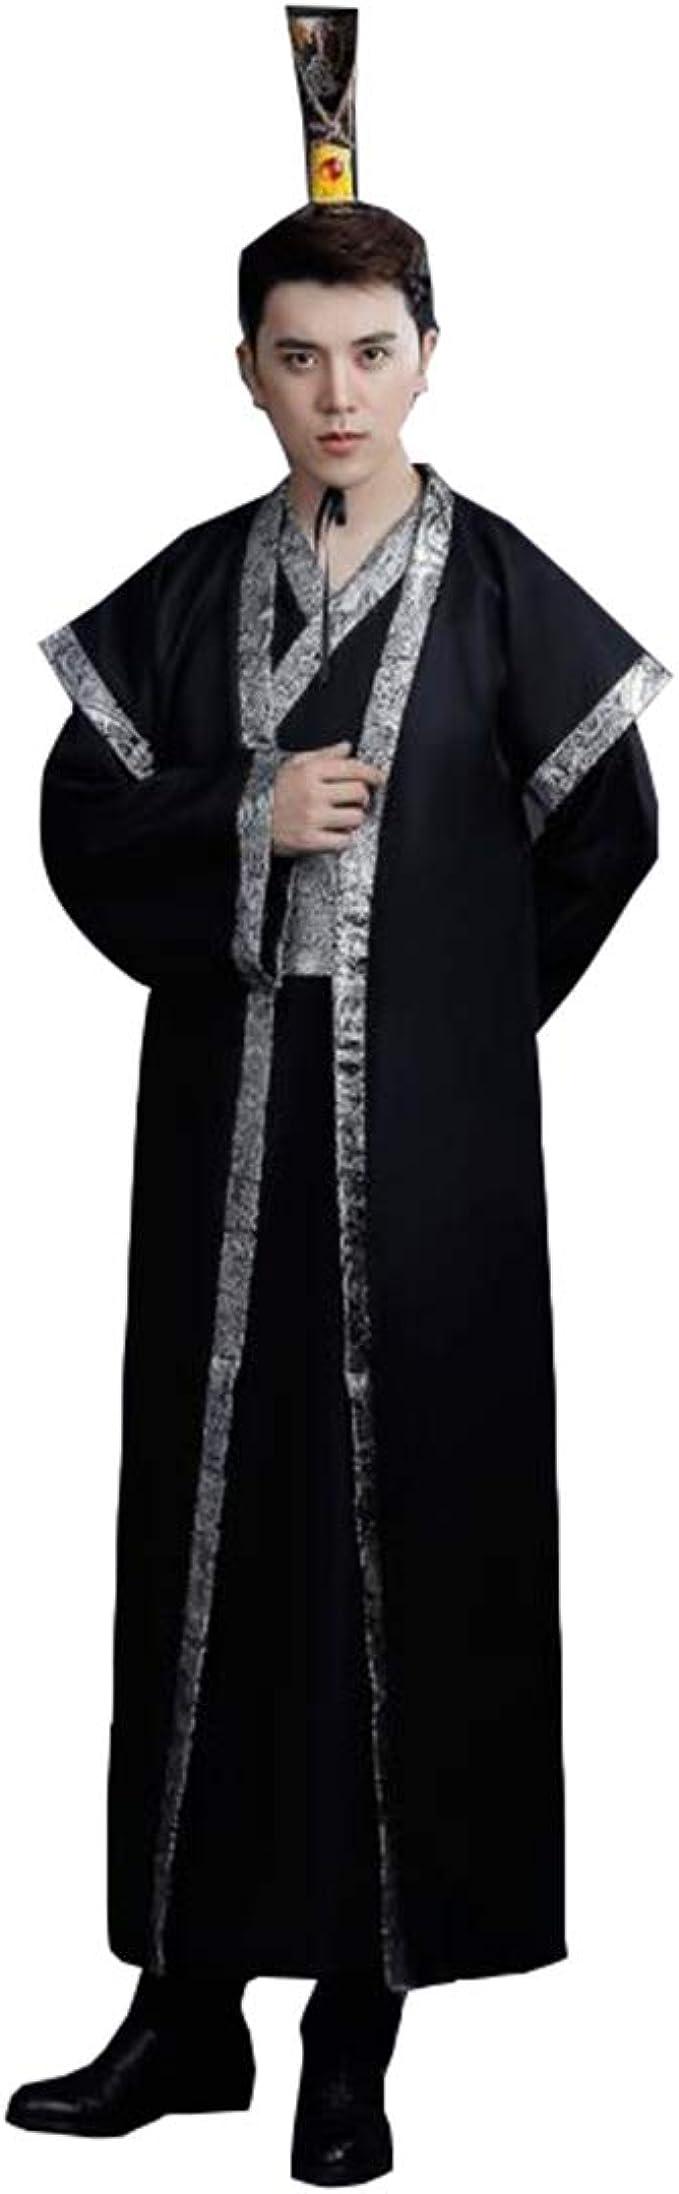 Amazon.com: Ez-sofei - Vestido largo para hombre, traje ...